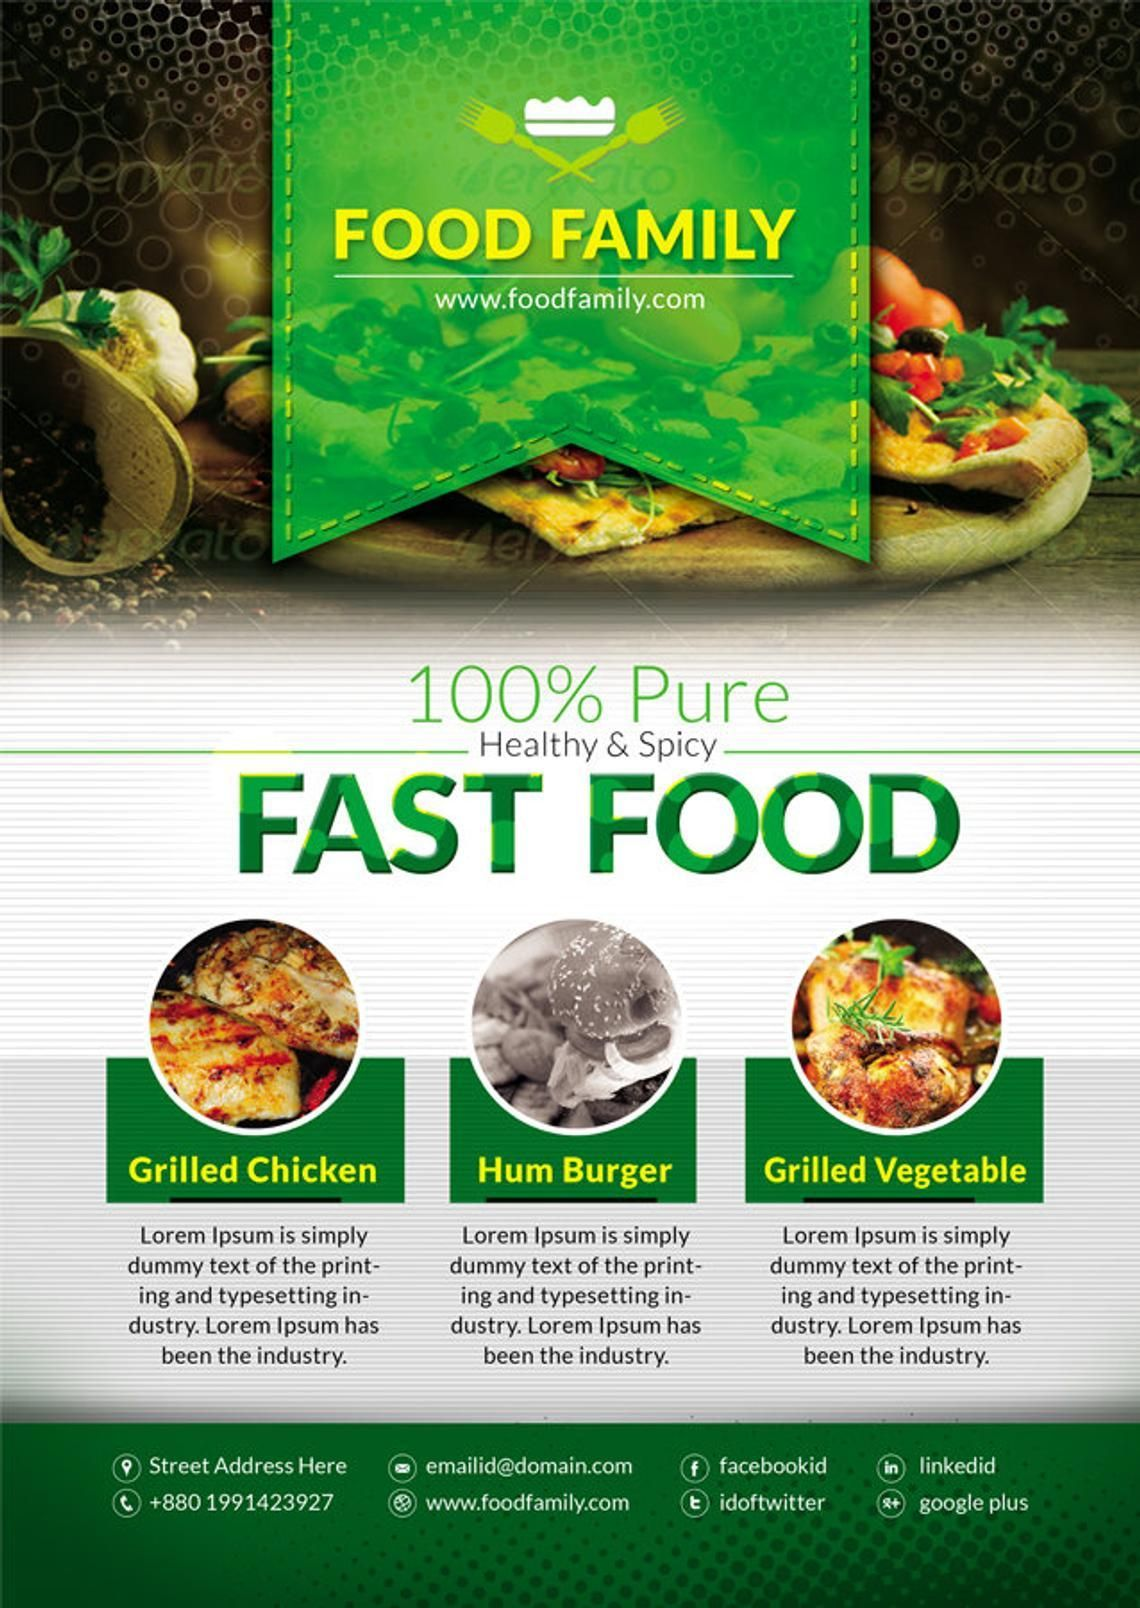 Food Family - Fast Food Restaurant Flyer and Poster Design Template, Slide 3, 08839, Food & Beverage — PoweredTemplate.com